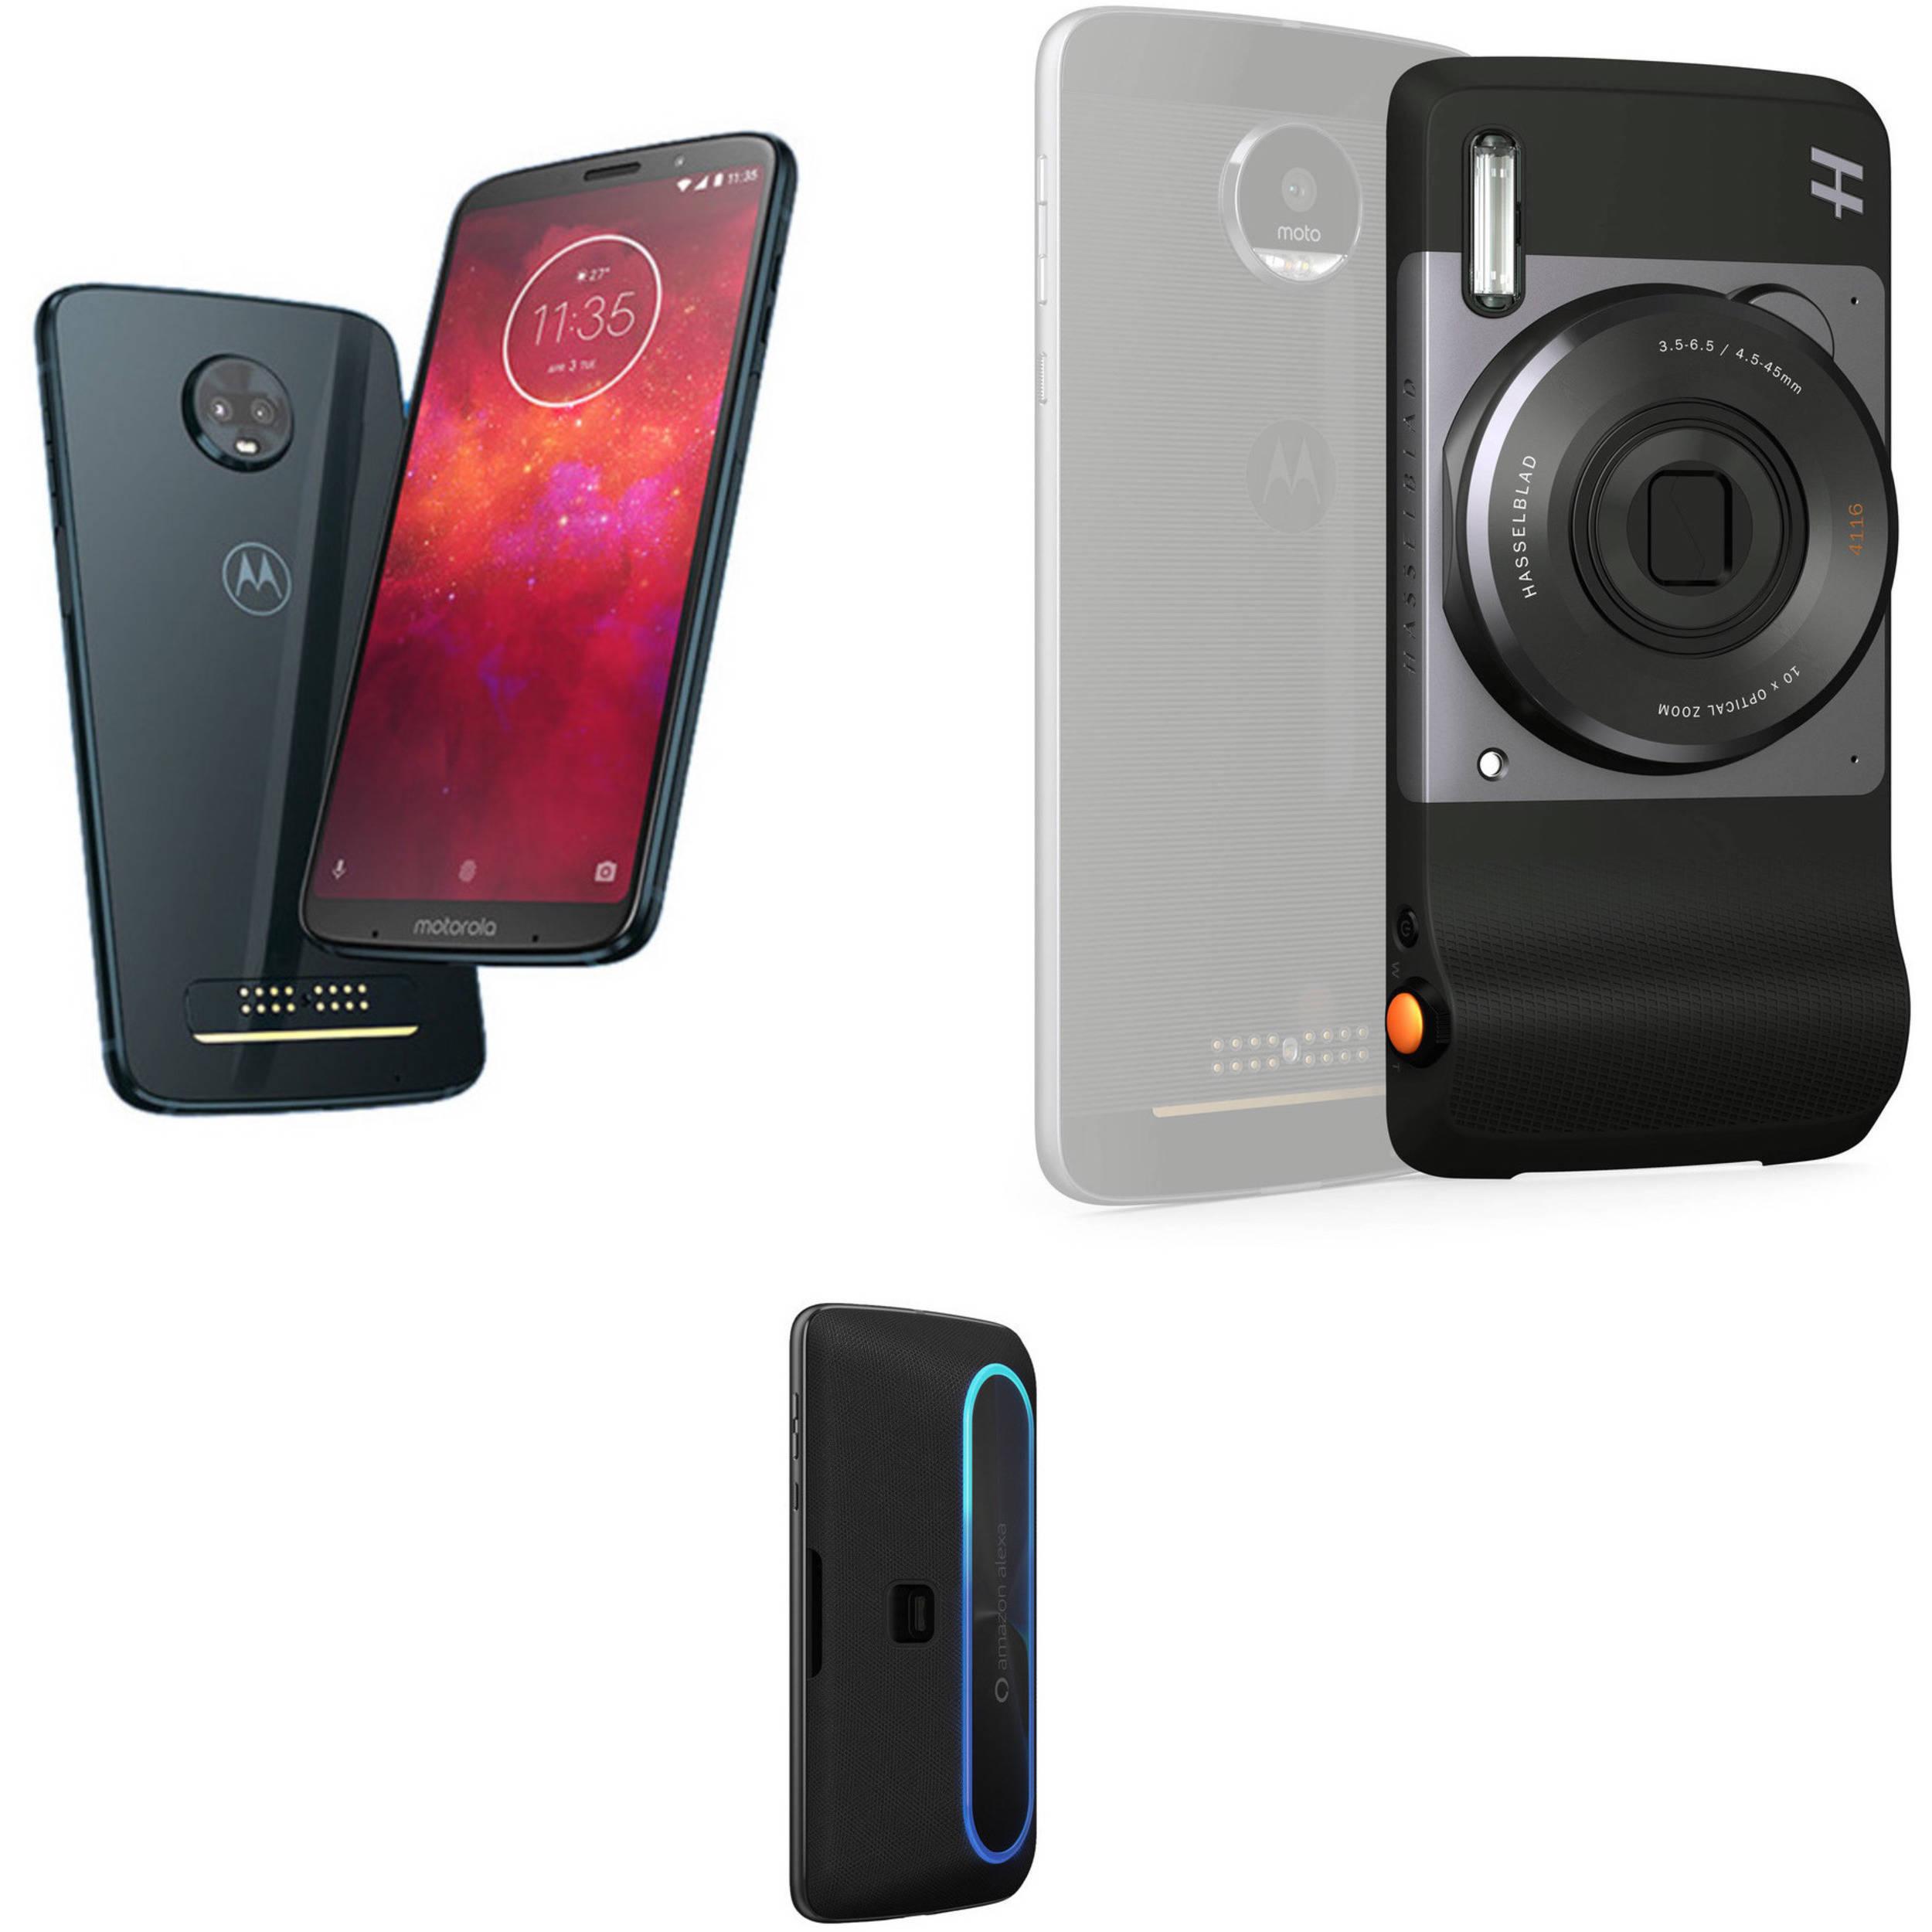 buy online c33df b9b75 Moto Z3 Play 64GB Smartphone with Camera/Speaker Moto Mods